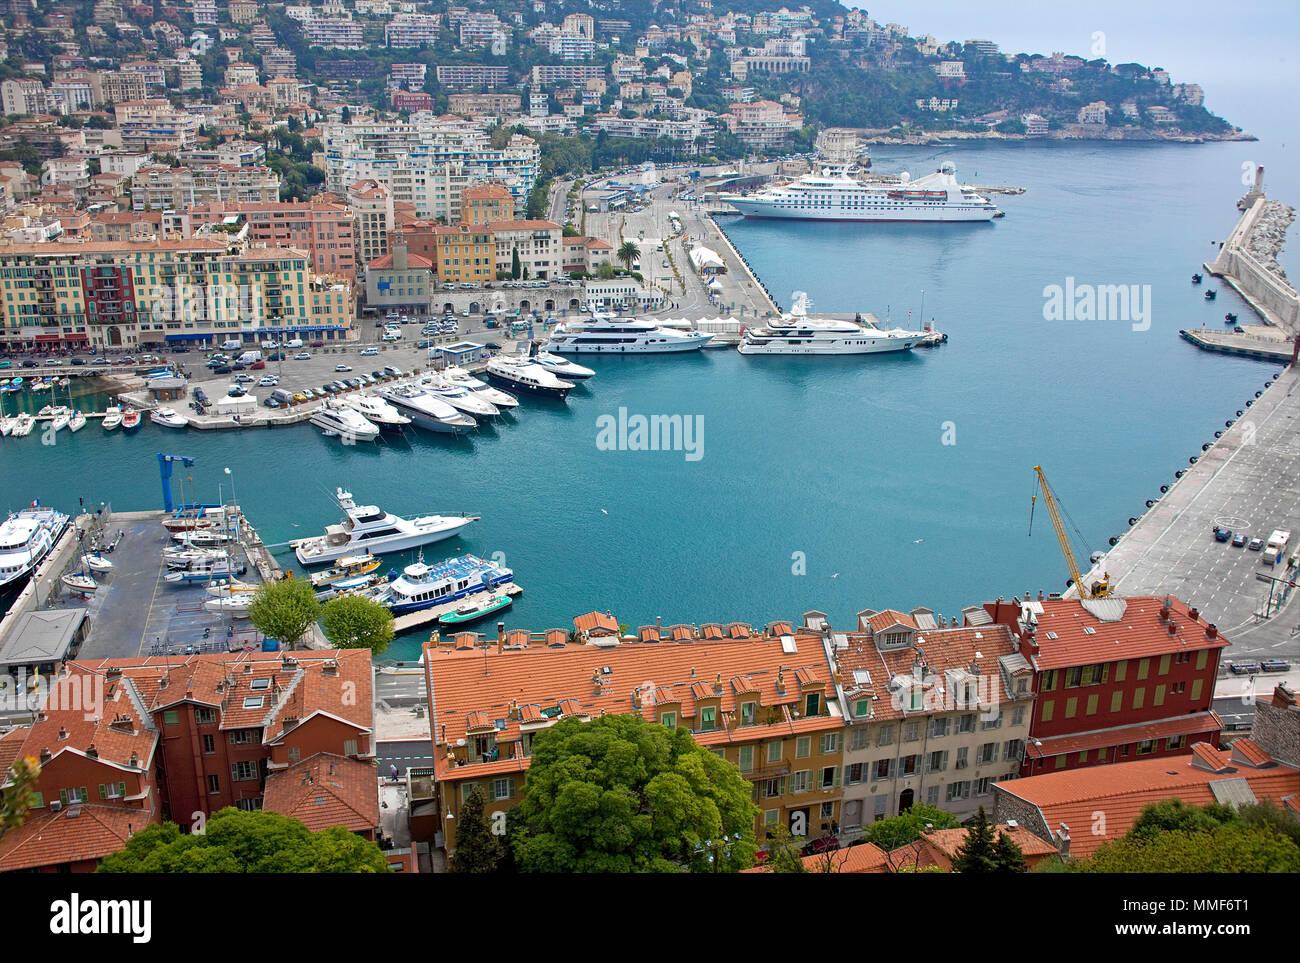 Hafen von Nizza, Côte d'Azur, Alpes-Maritimes, Suedfrankreich, Frankreich | Harbour of Nice, Côte d'Azur, Alpes-Maritimes, South France, France - Stock Image